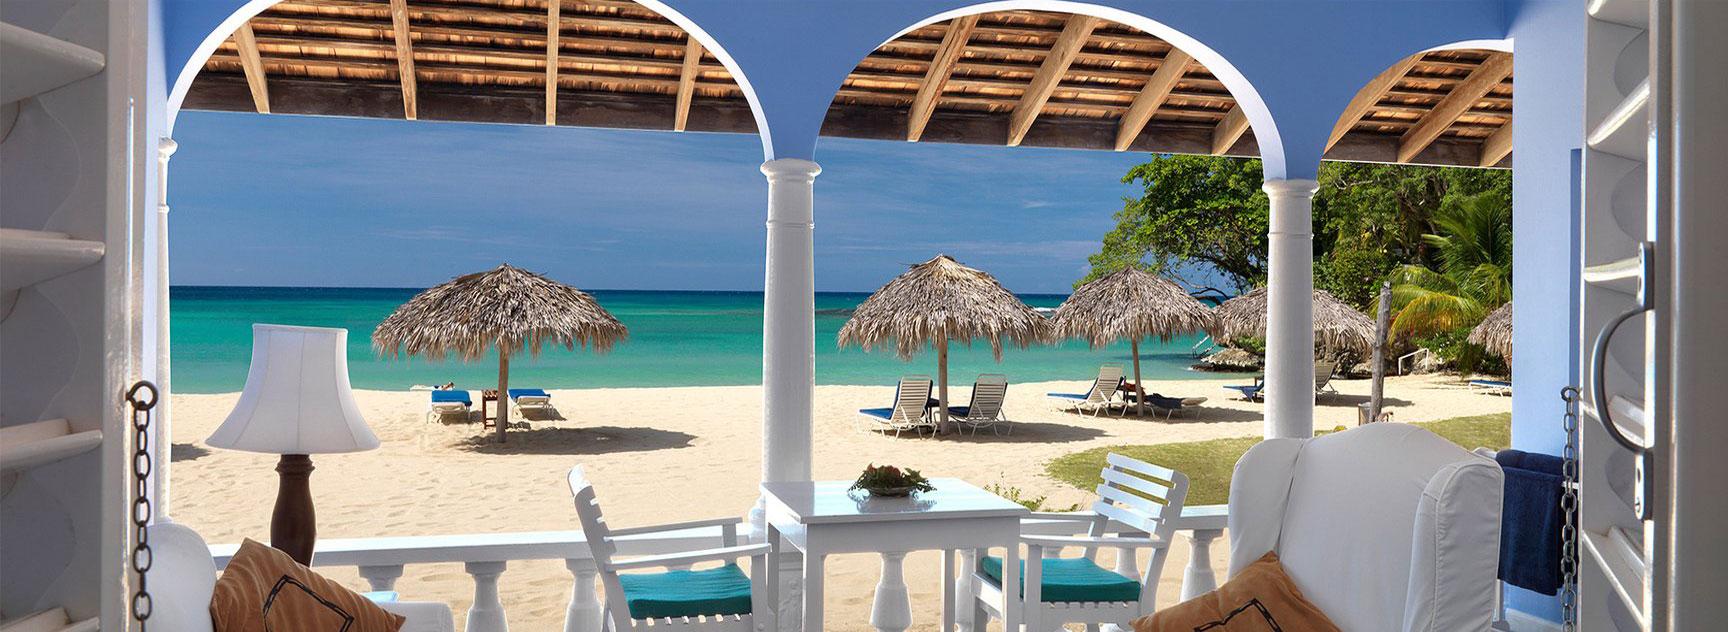 veranda-jamaica-inn-hotel